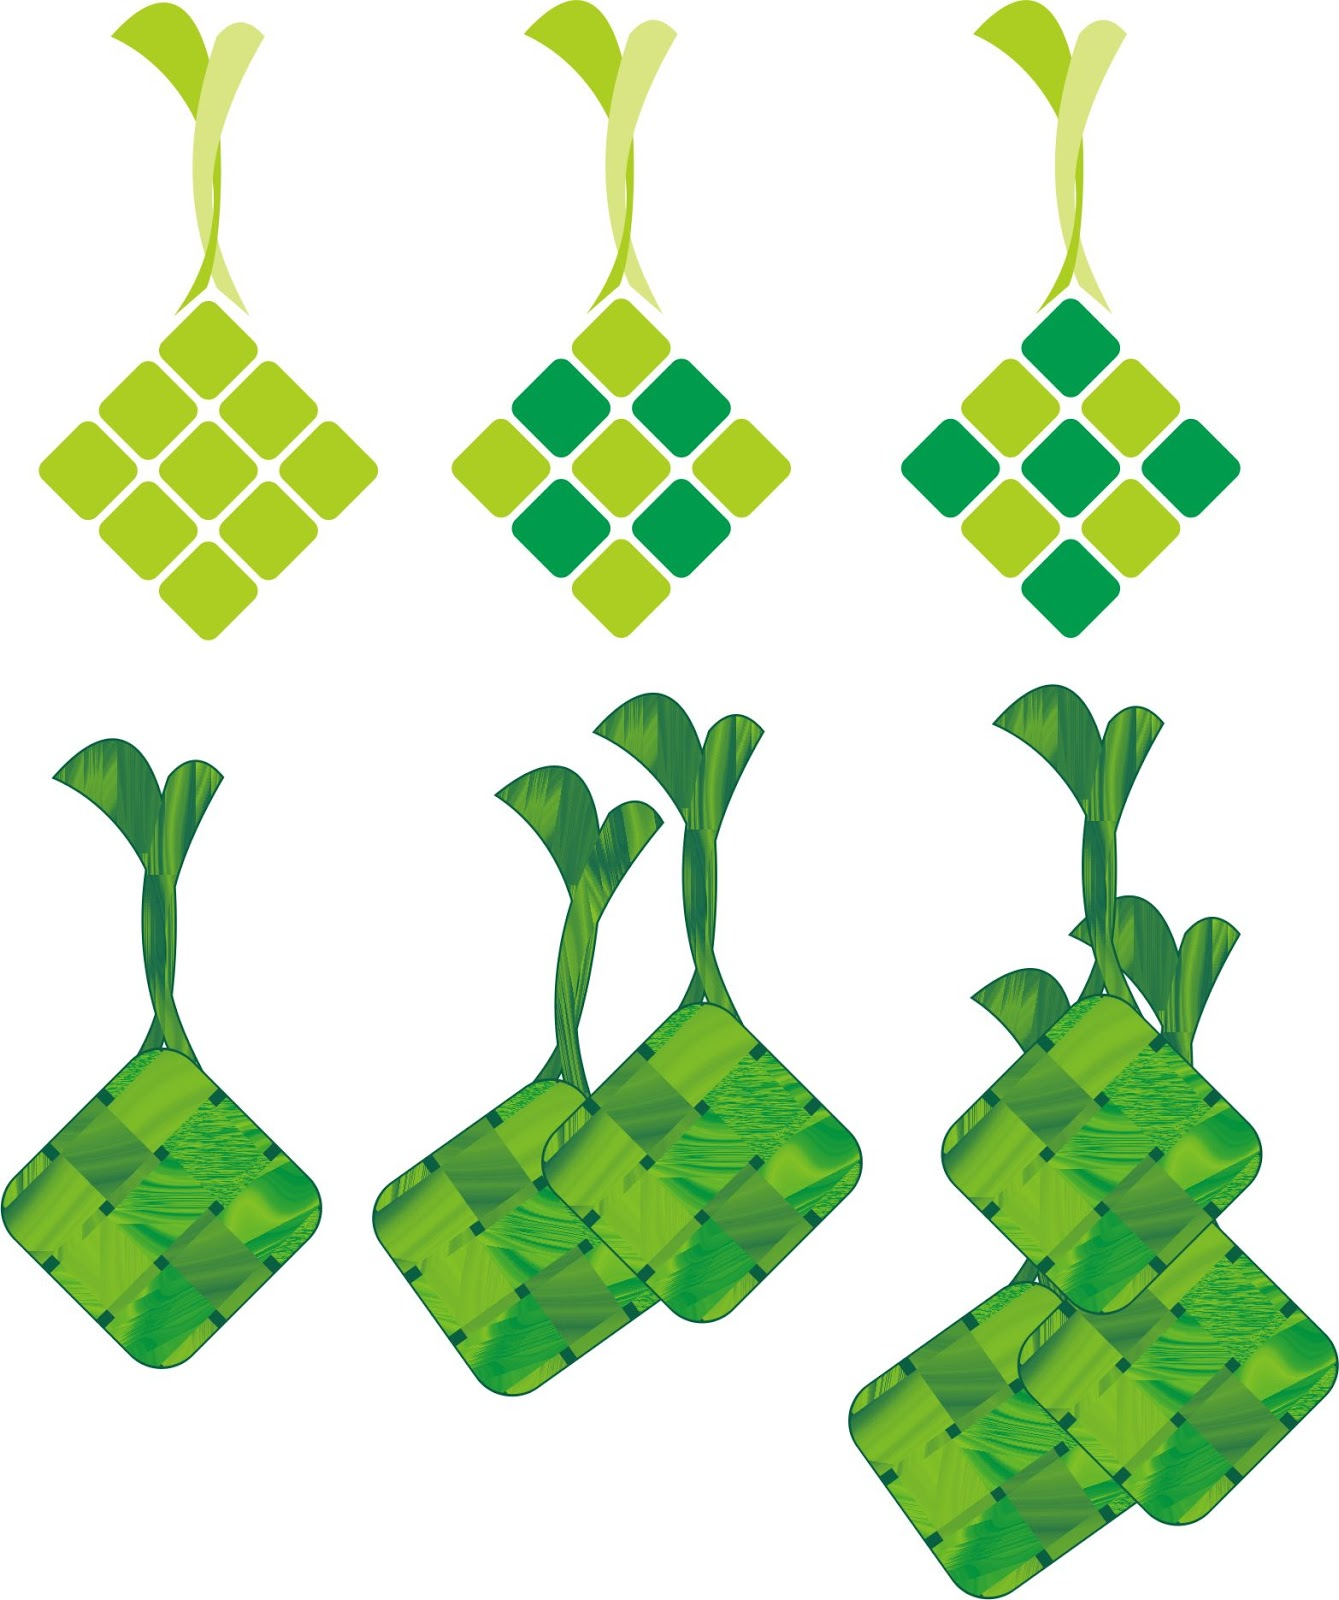 ... ketupat cdr) di link donwload gambar ketupat . Buka dengan corel 15